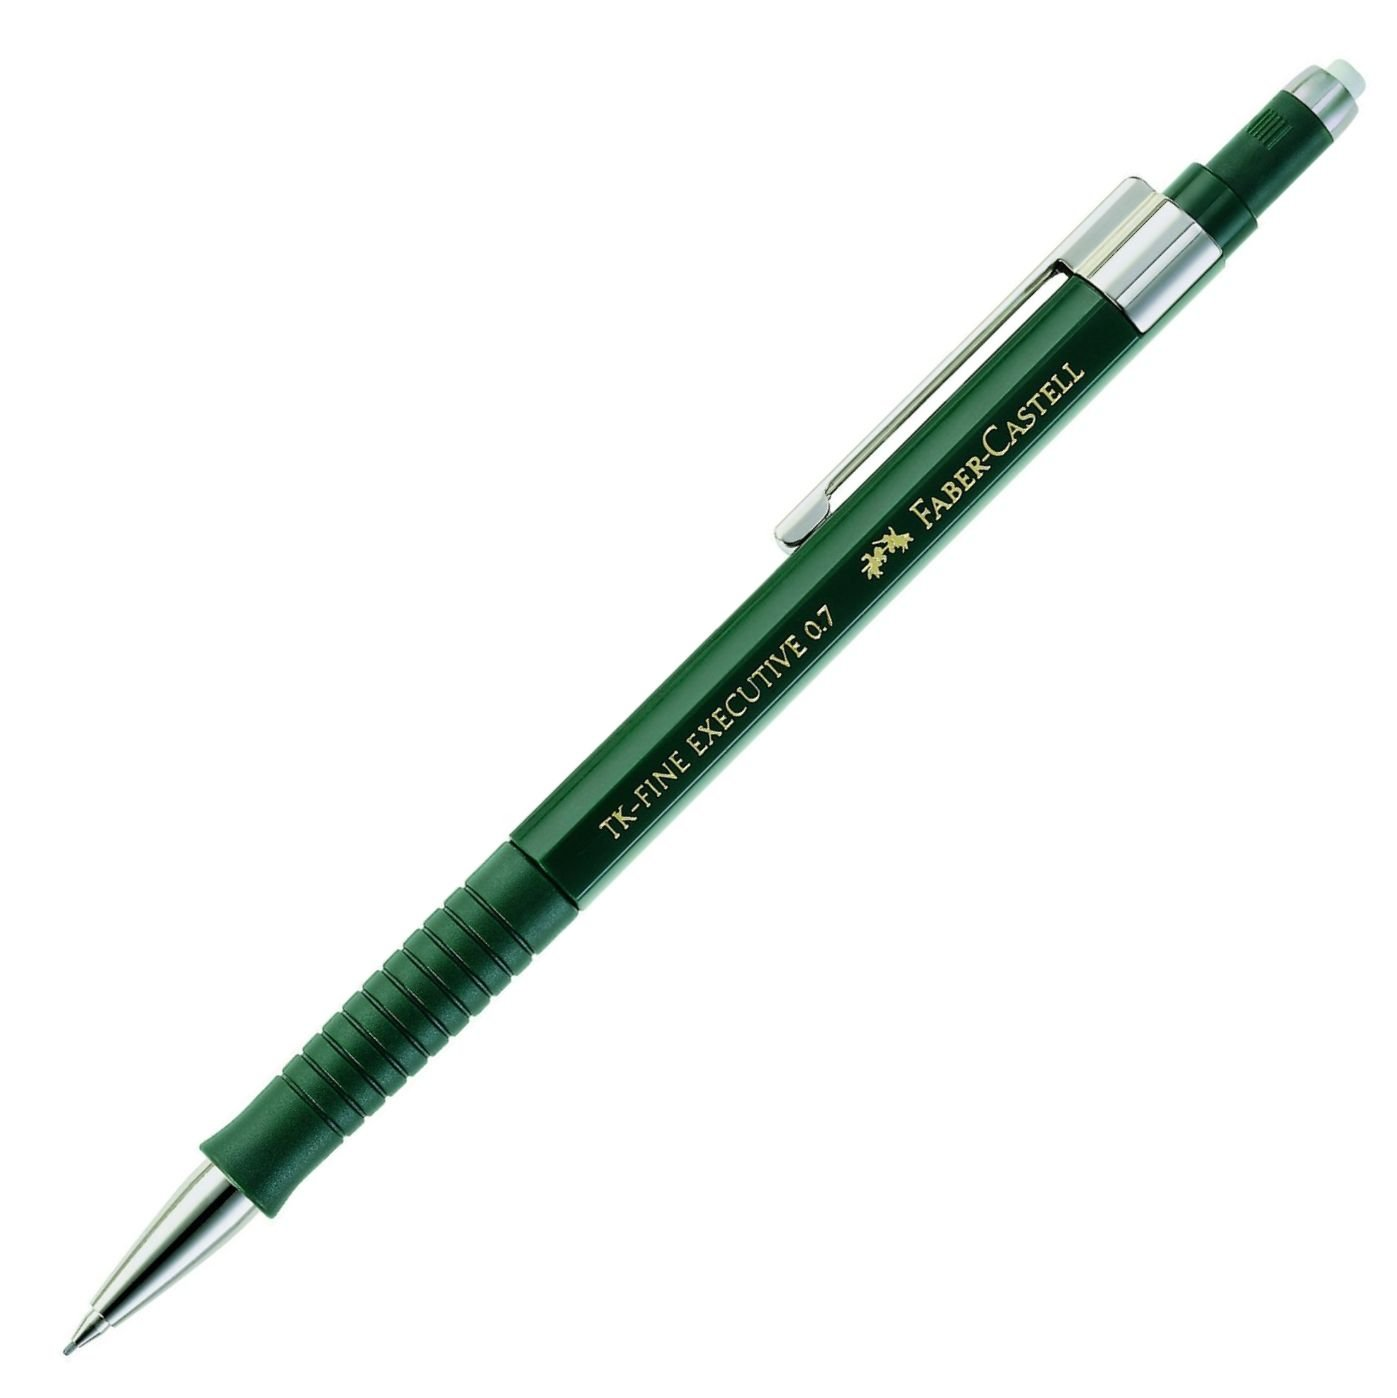 Faber-Castell 131700 Schaftfarbe: gr/ün Minenst/ärke: 0,7 mm Druckbleistift TK-FINE EXECUTIVE